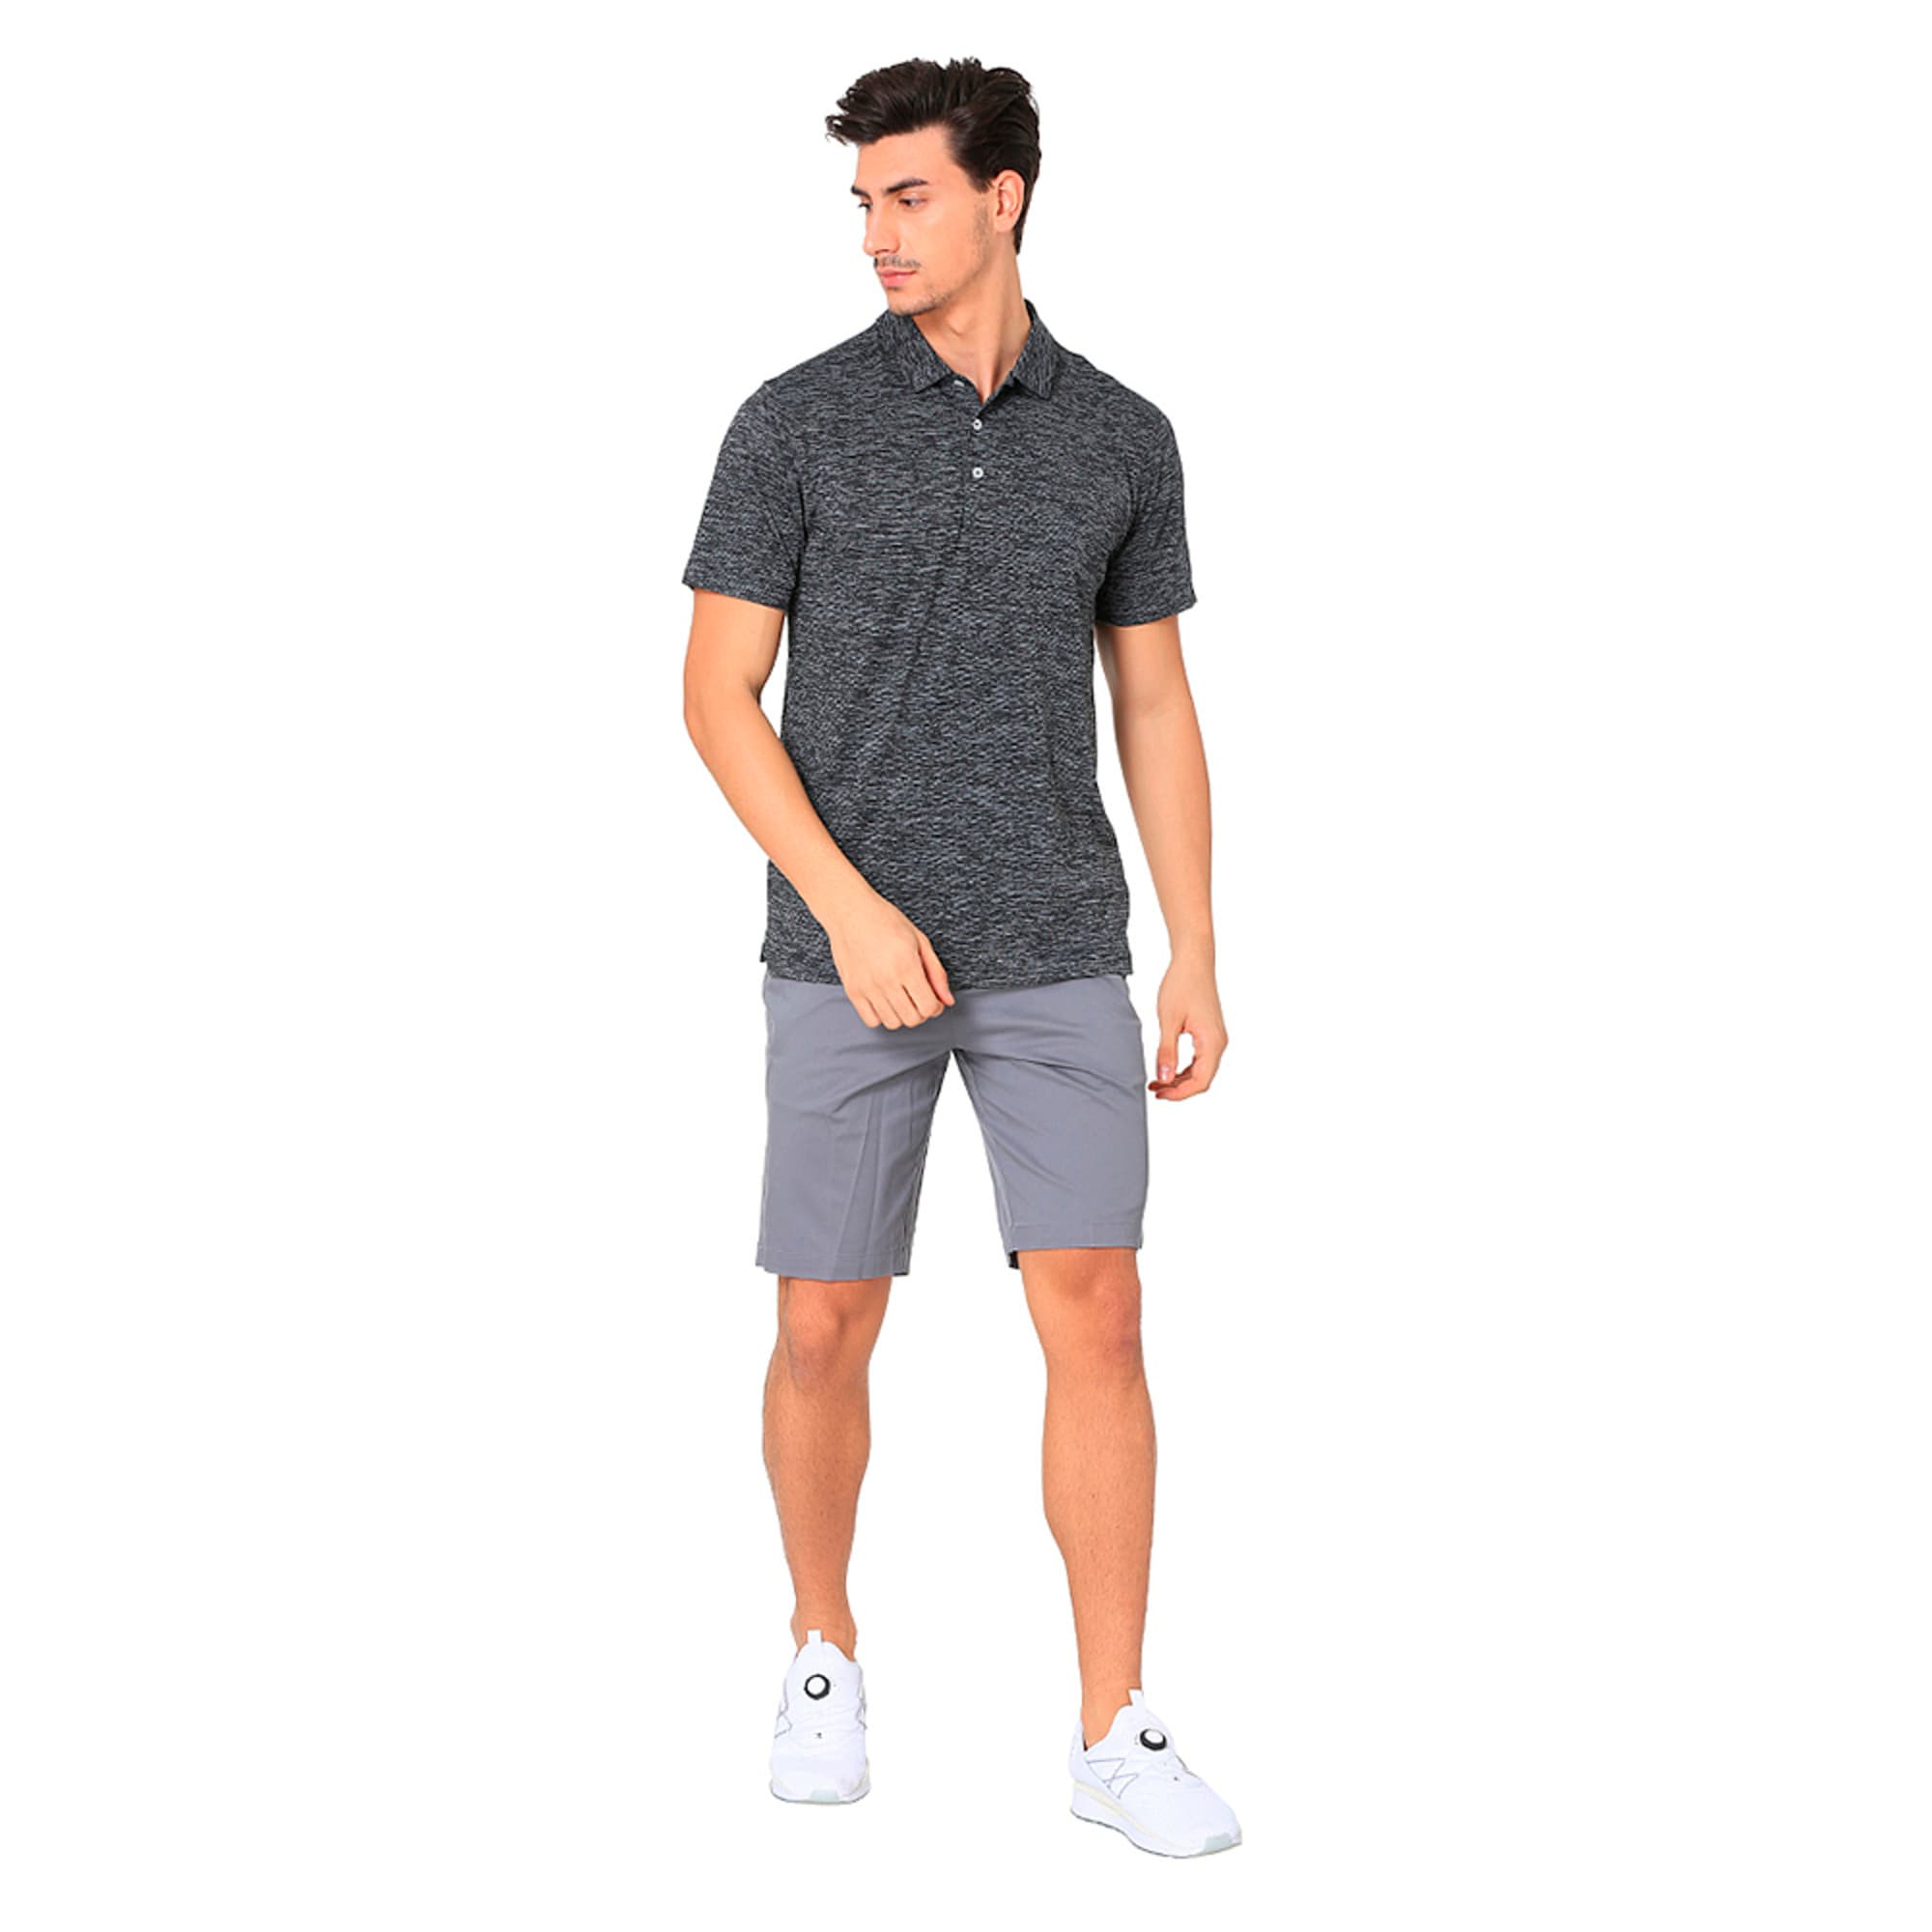 Thumbnail 6 of Essential Men's Golf Polo, Puma Black, medium-IND